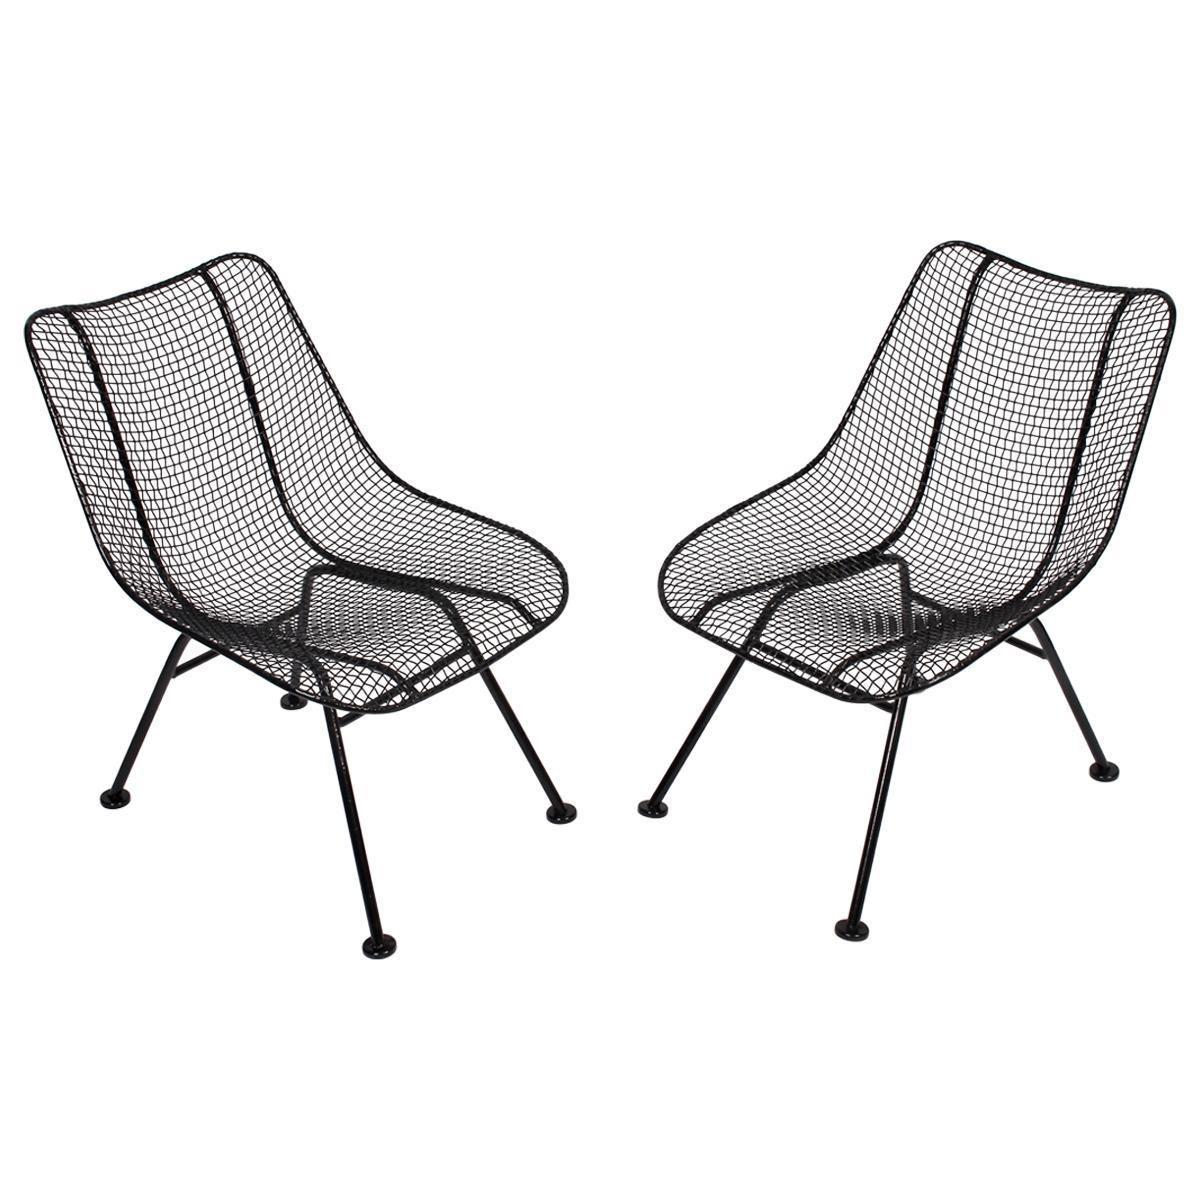 "Pair of Russell Woodard Black ""Sculptura"" Lanai Chairs, 1950s"